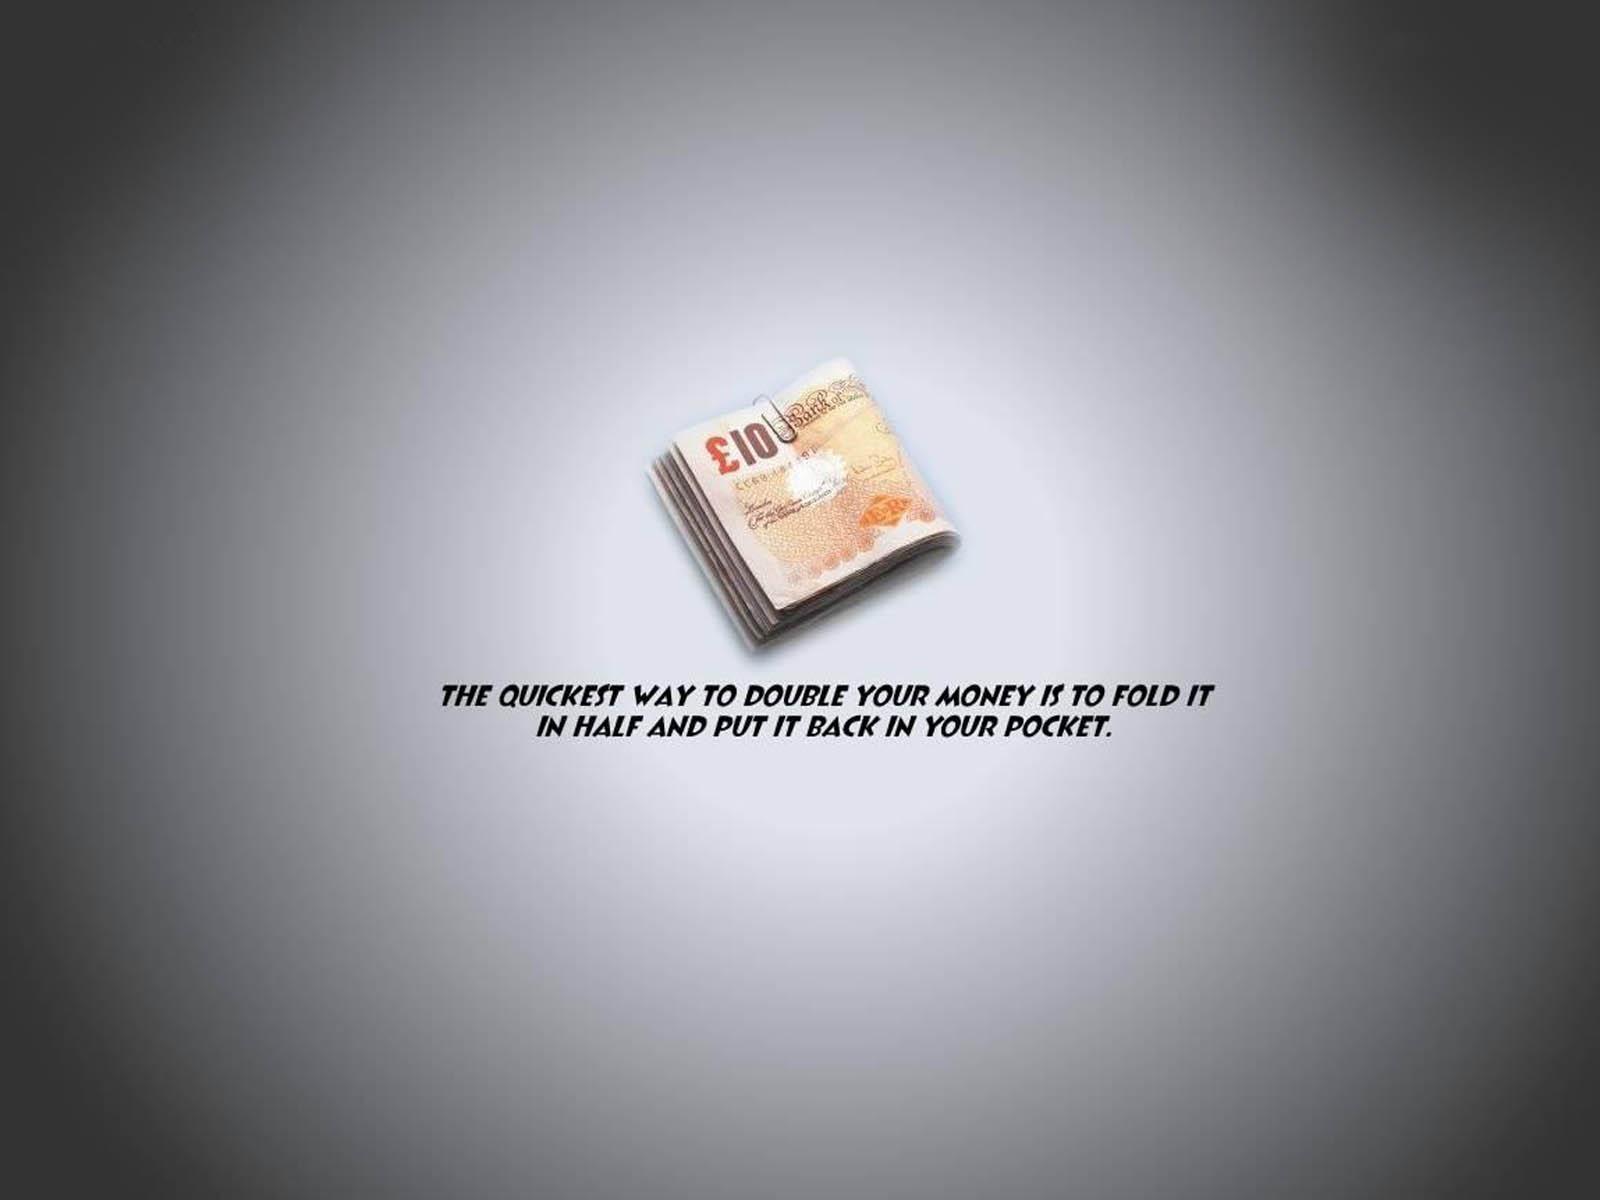 75 Nice Quotes Wallpapers On Wallpapersafari